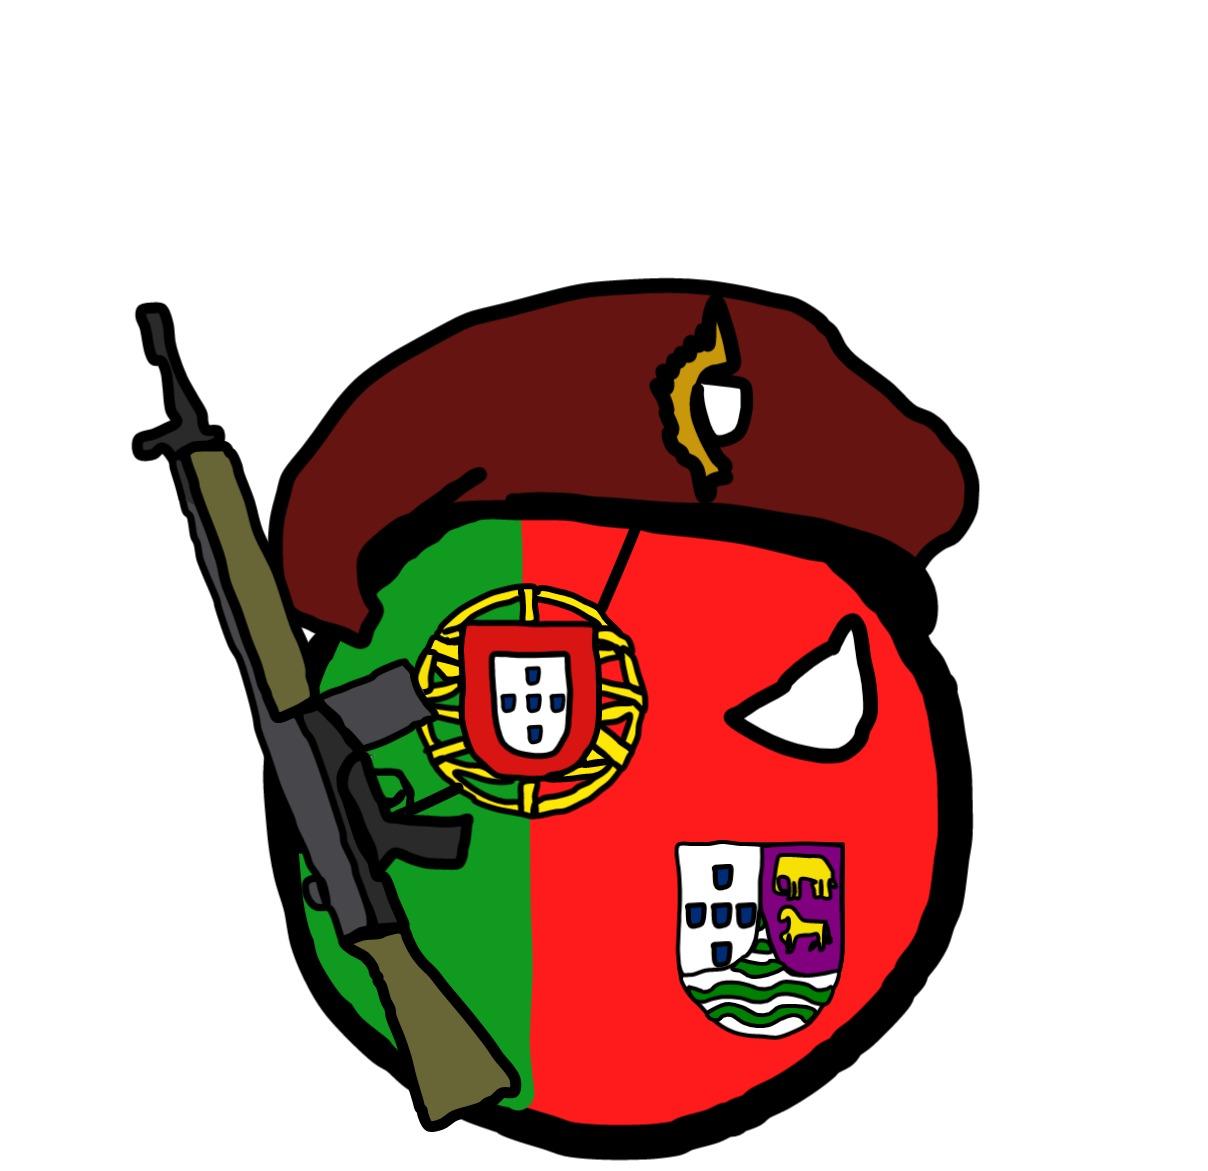 Portuguese Angolaball